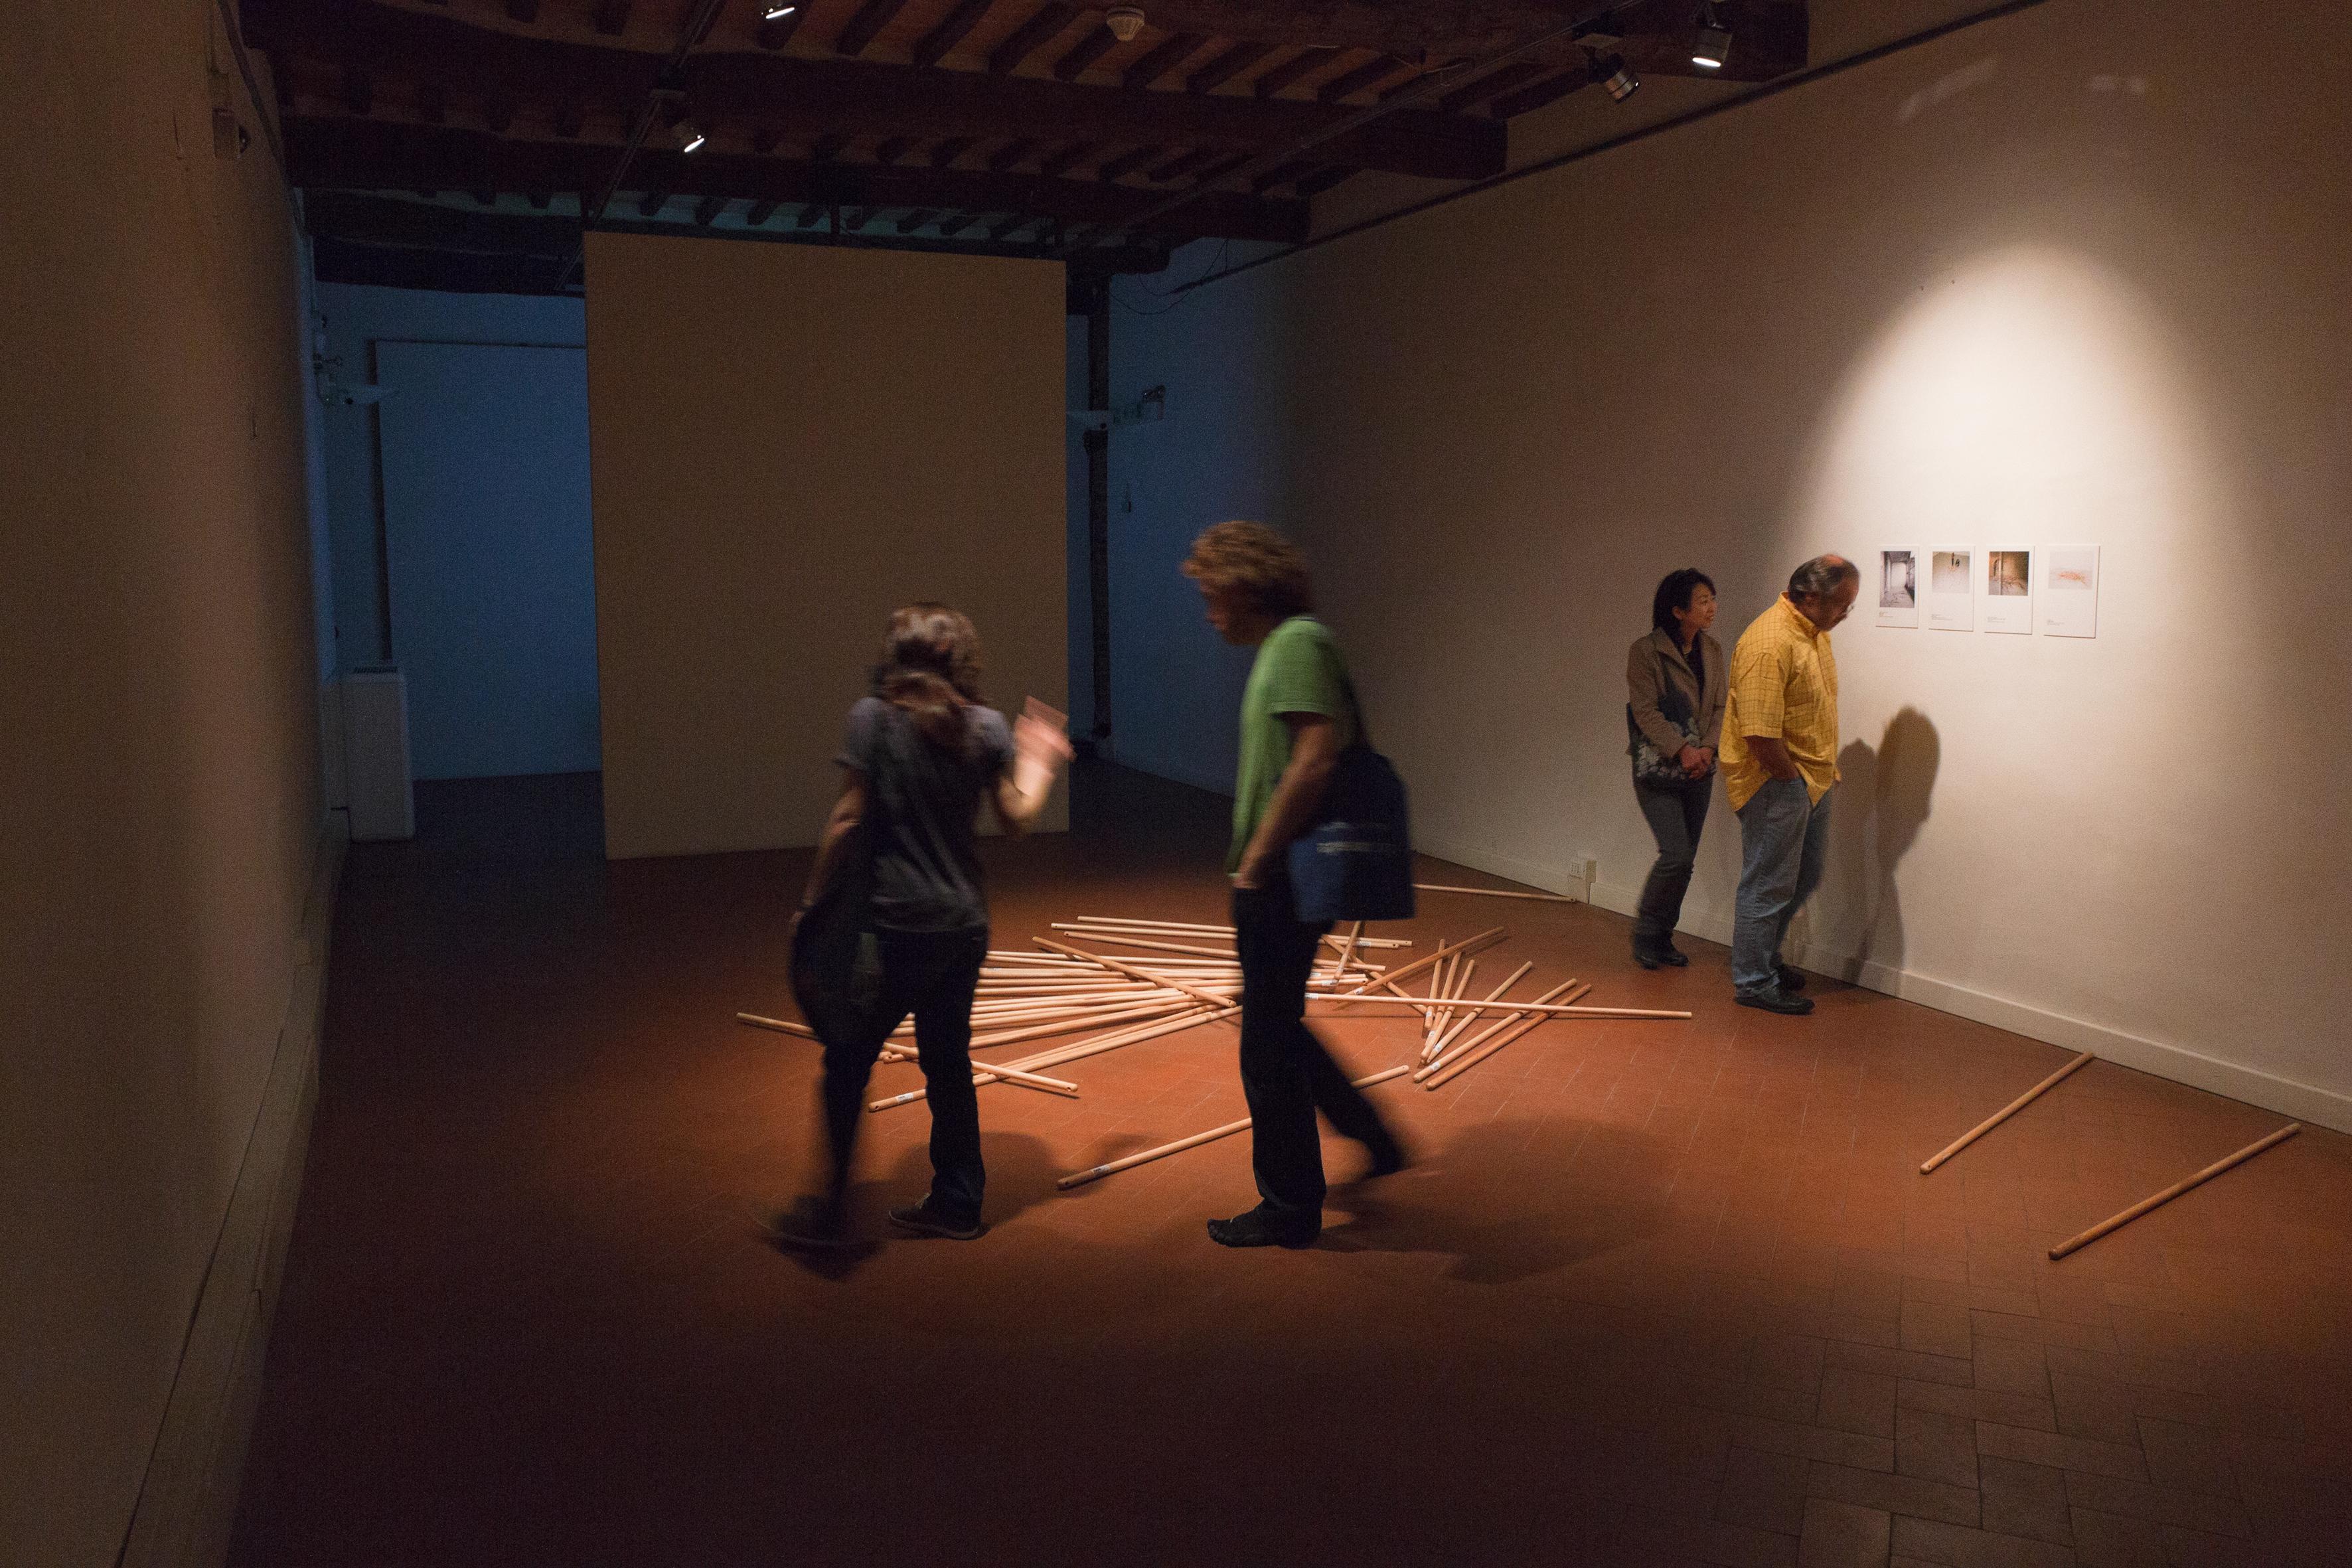 6 Exhibition view